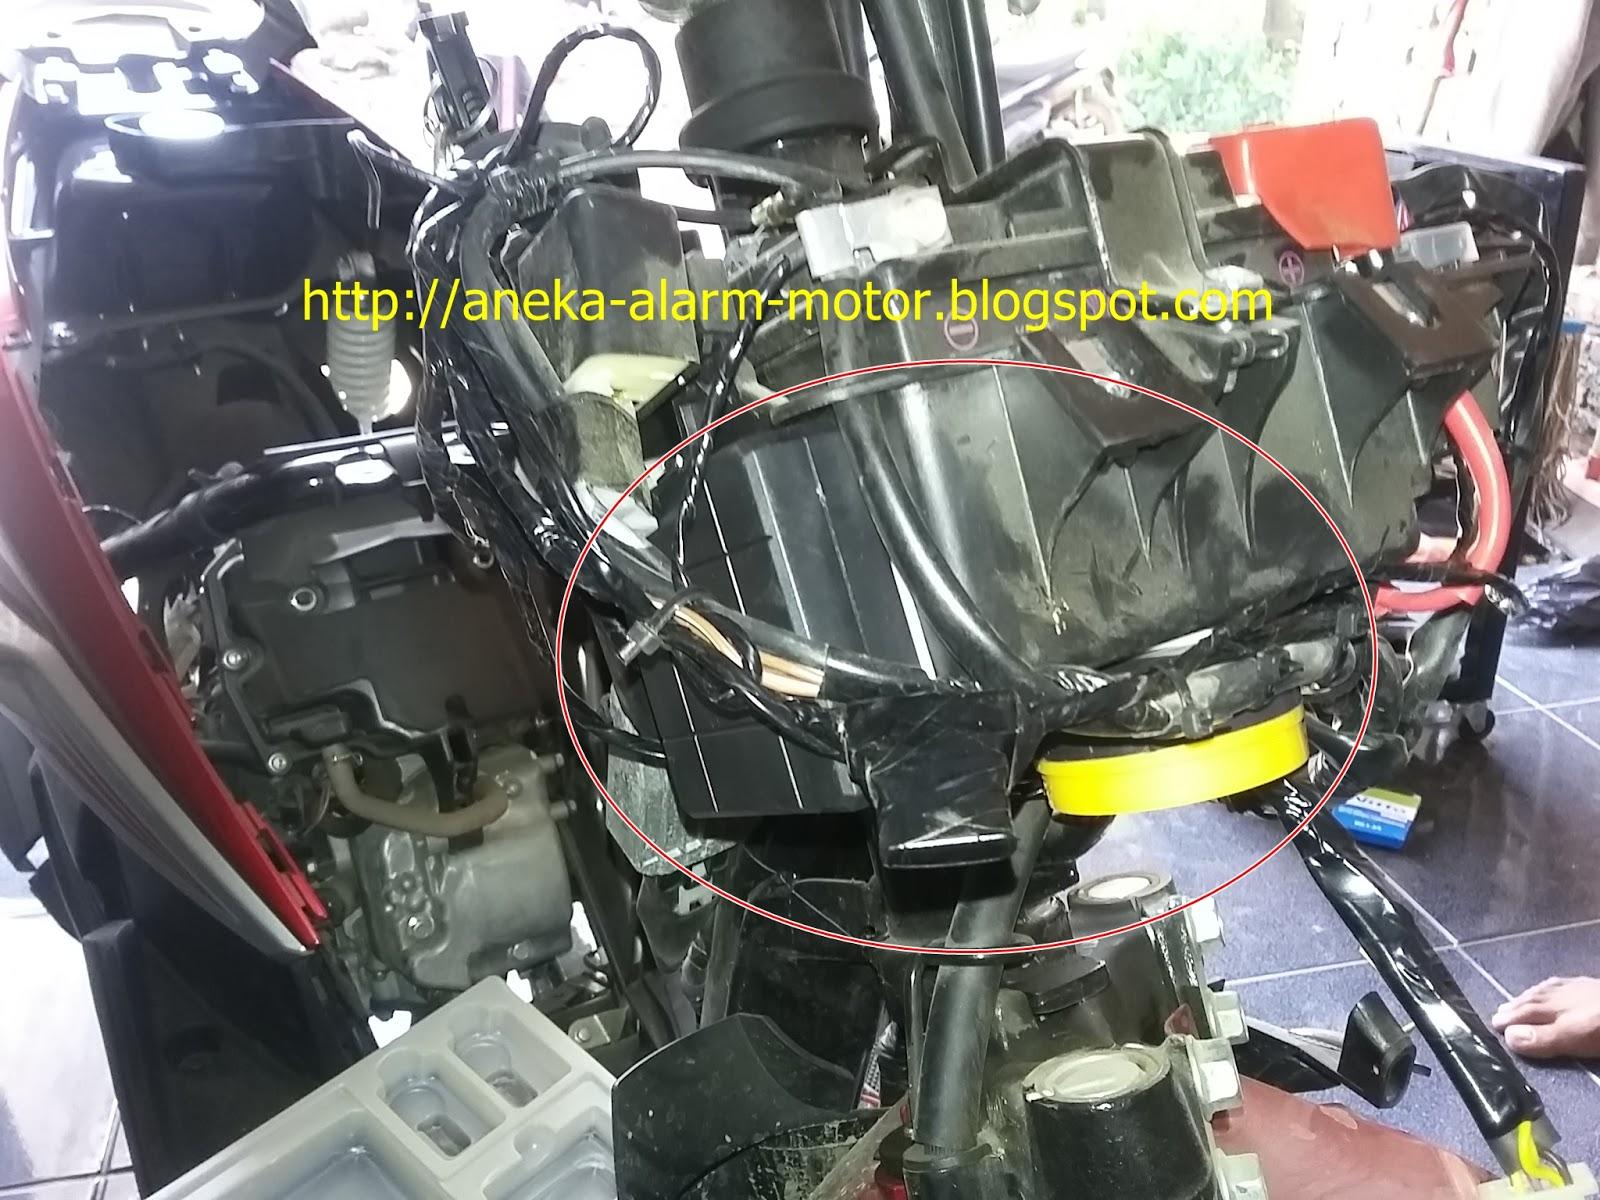 Aneka Alarm Motor: Cara pasang alarm motor remote pada ...